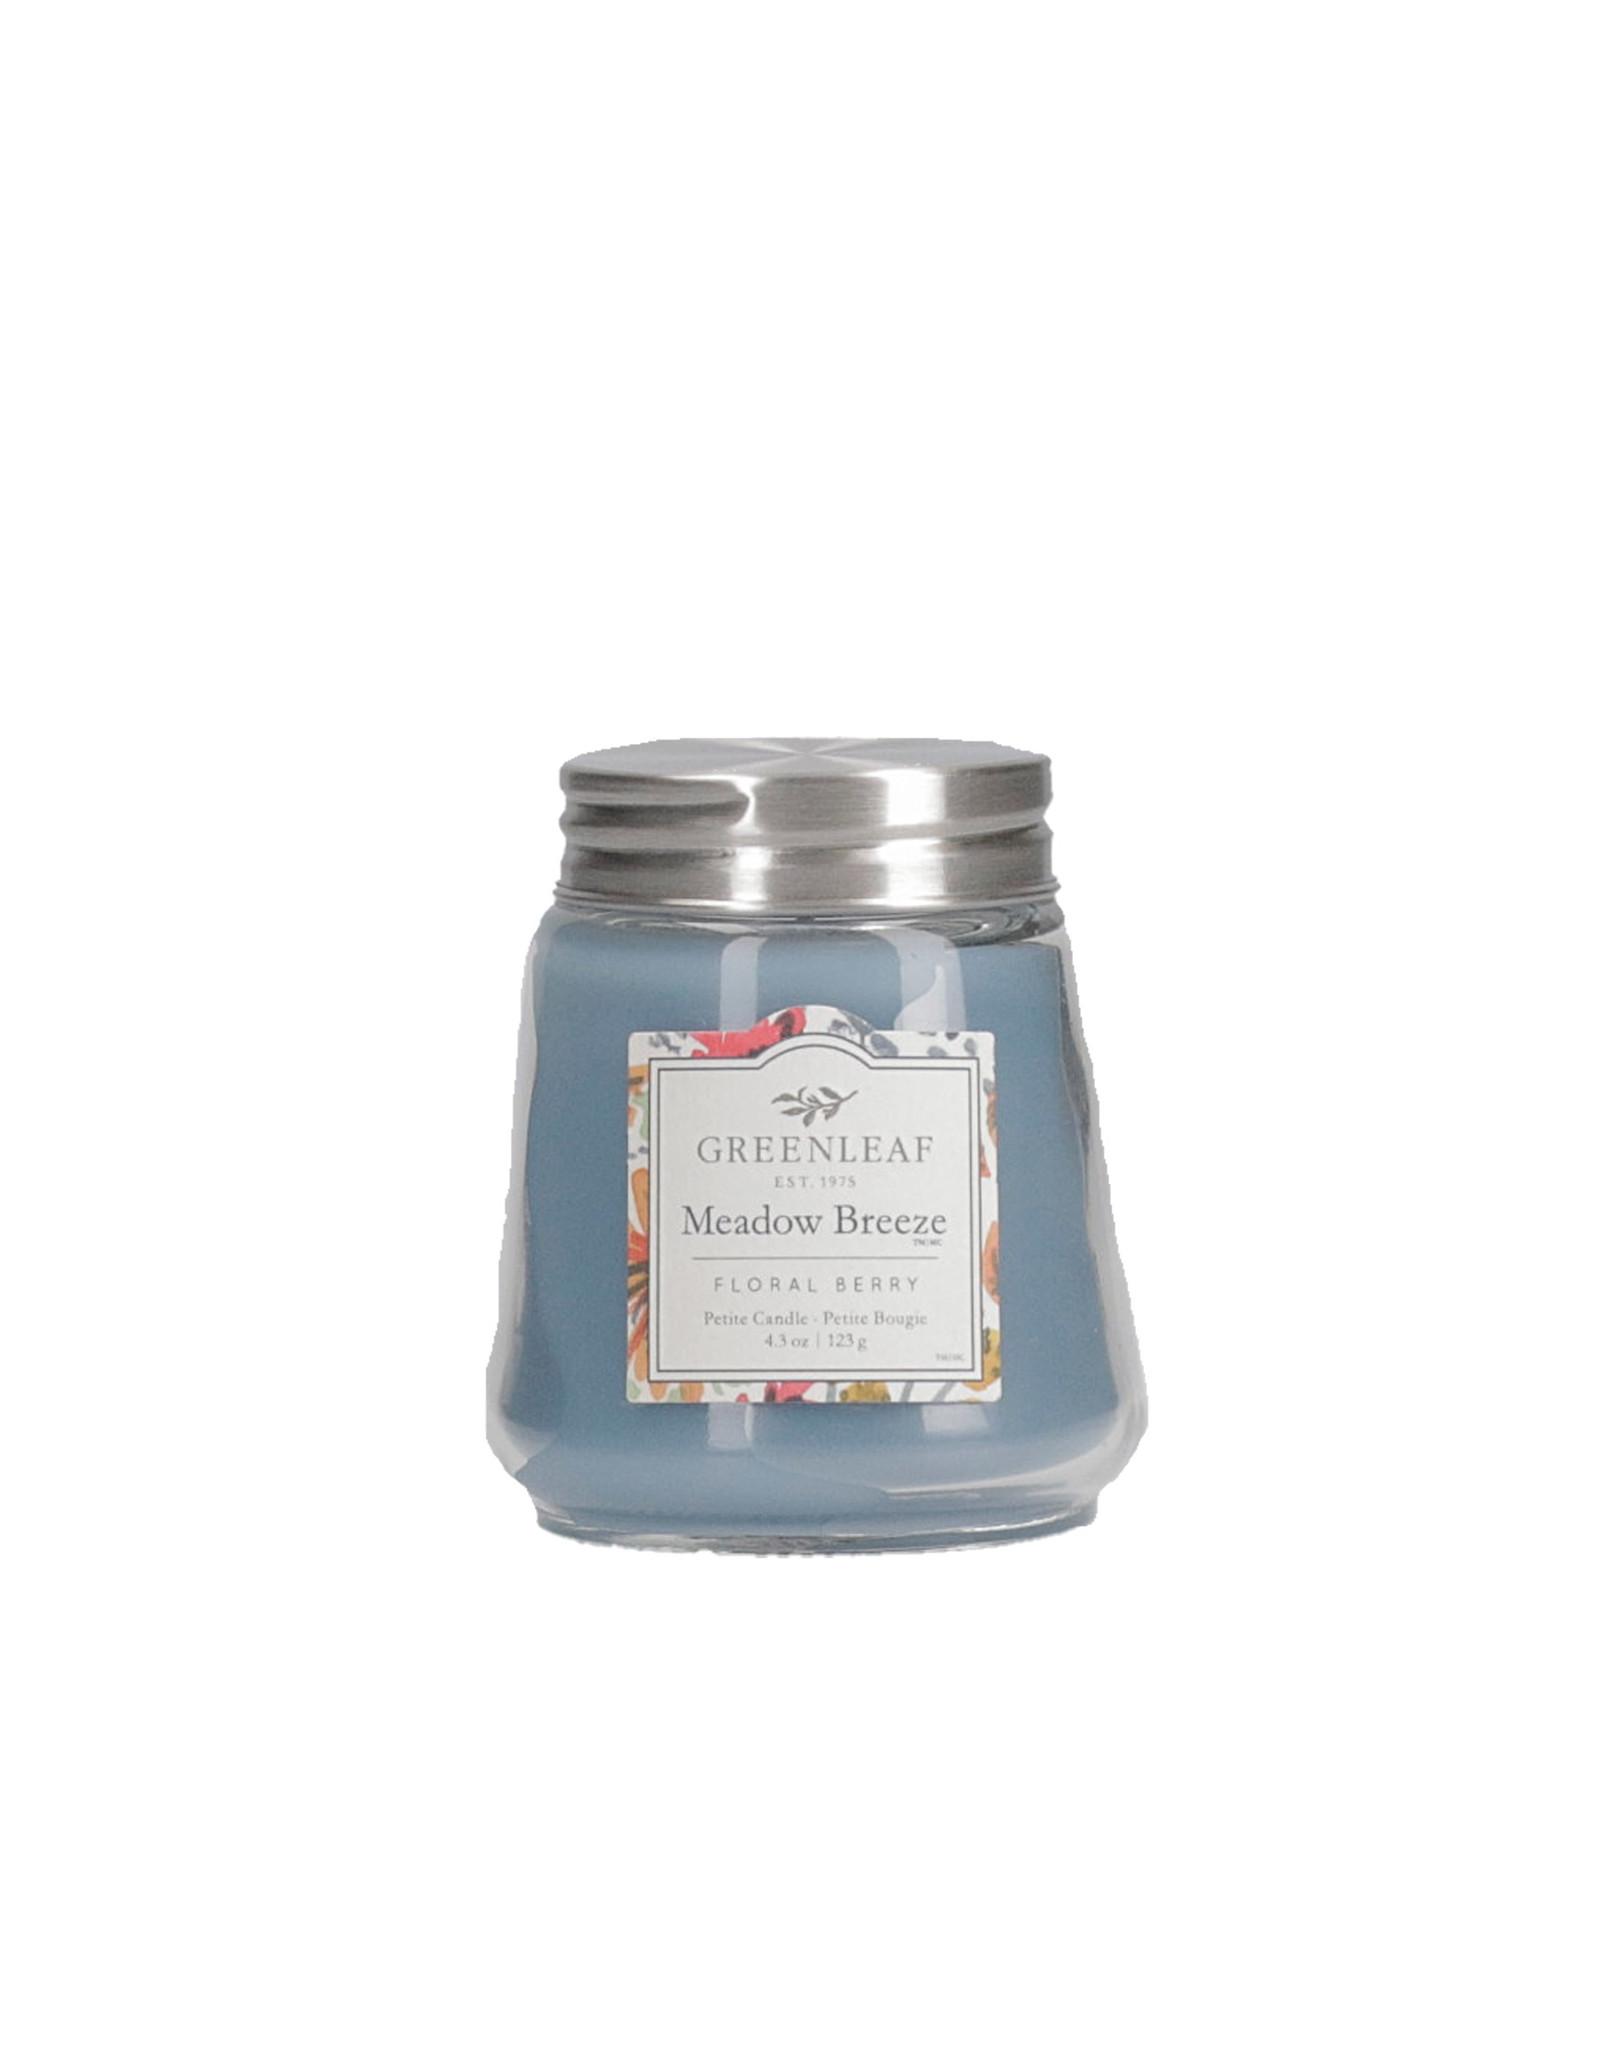 Greenleaf Meadow Breeze Candle Petite